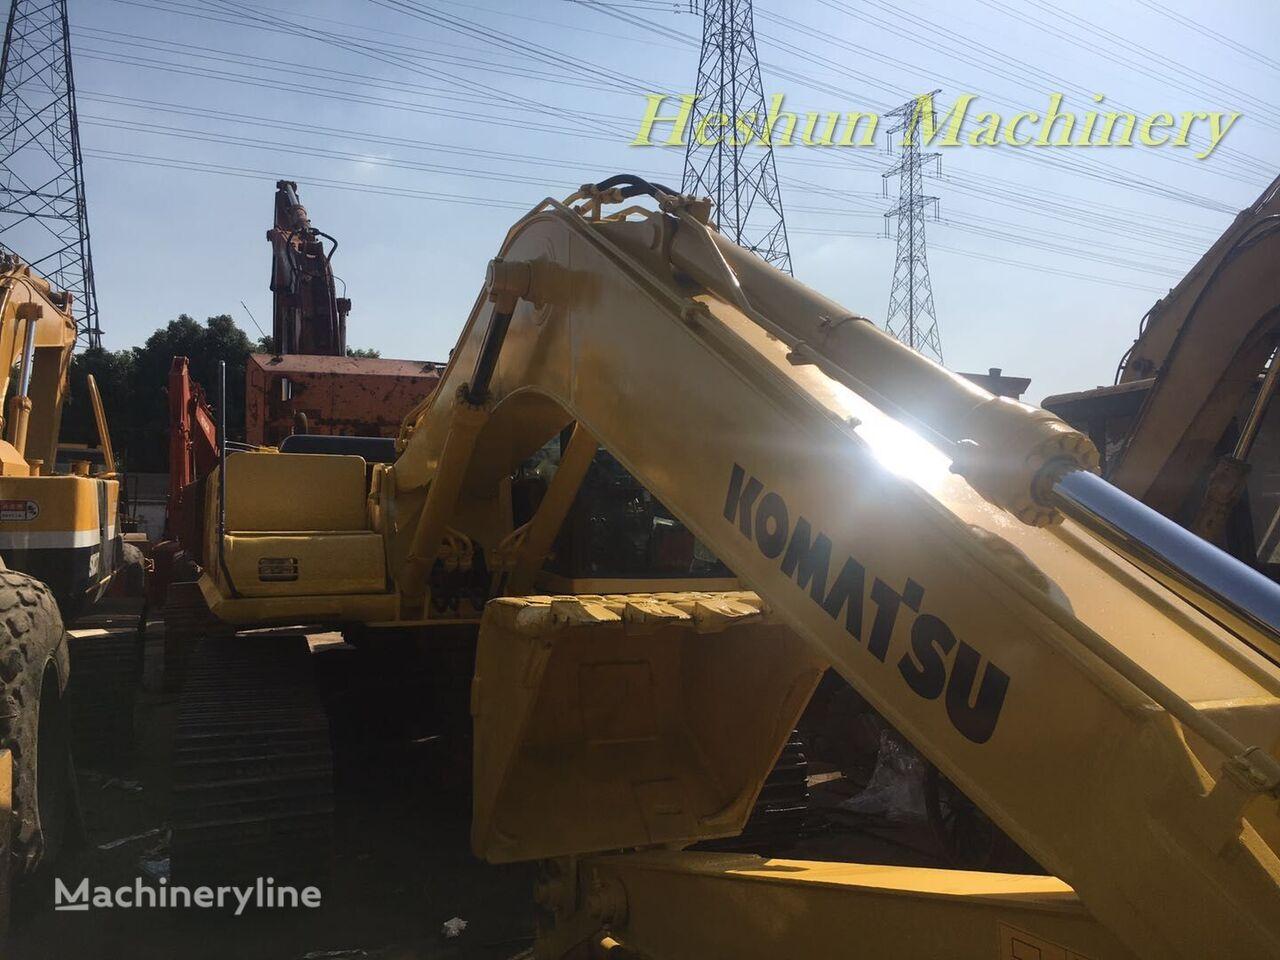 KOMATSU pc200-6 tracked excavator